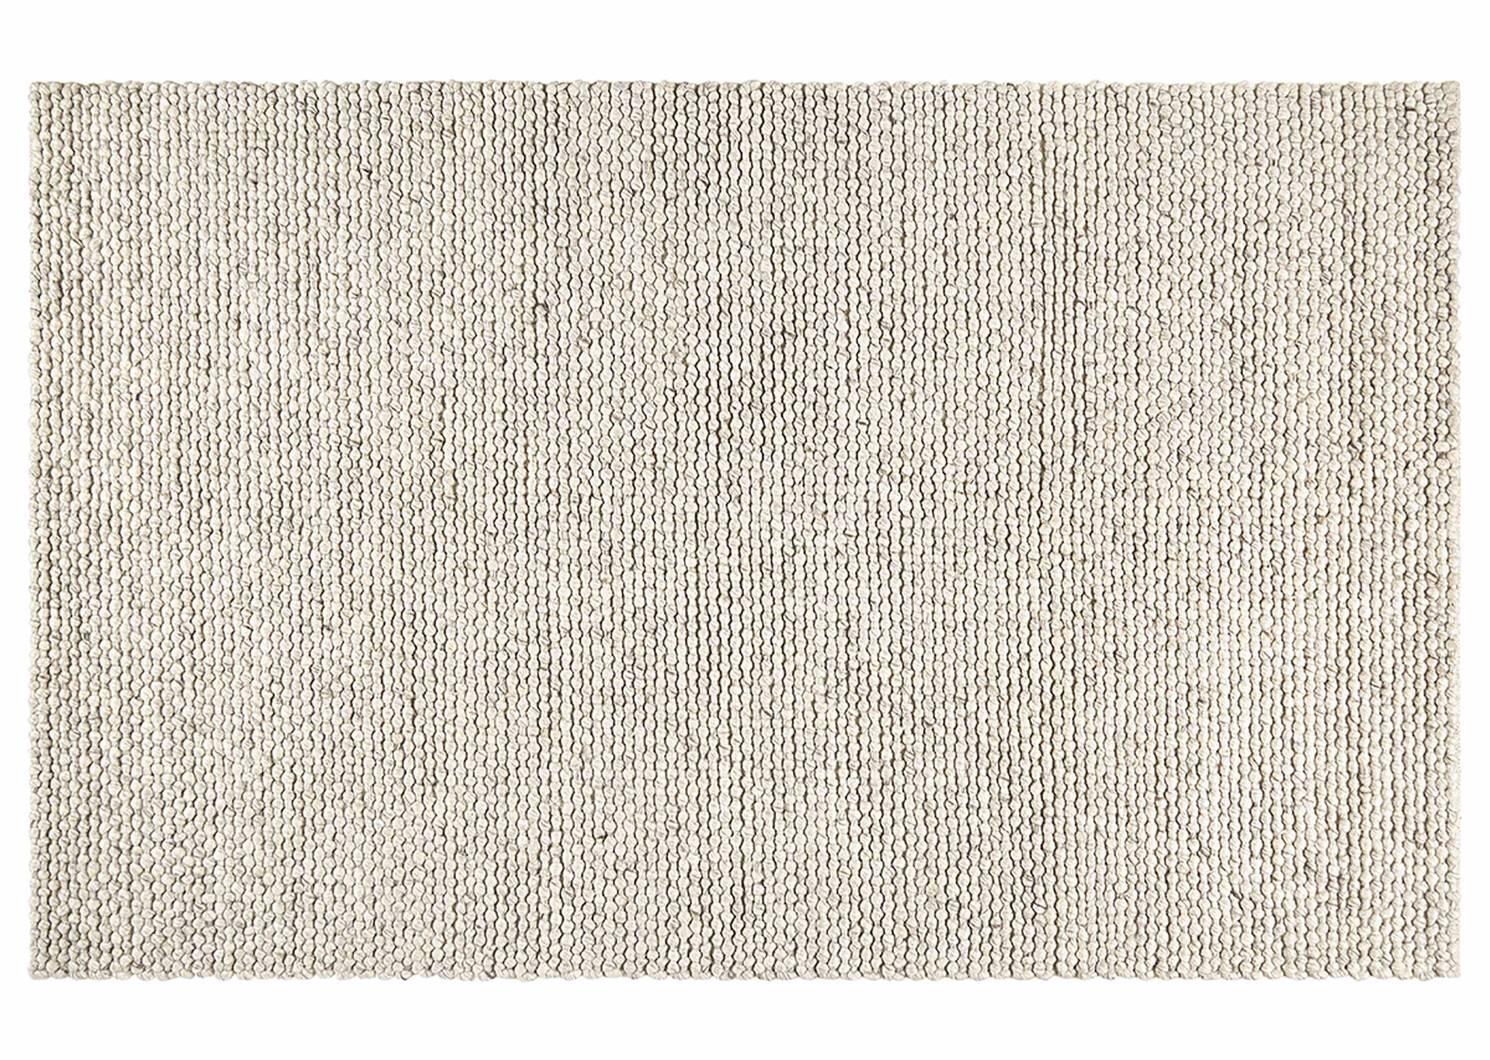 Tapis Victor 96x120 naturel/beige